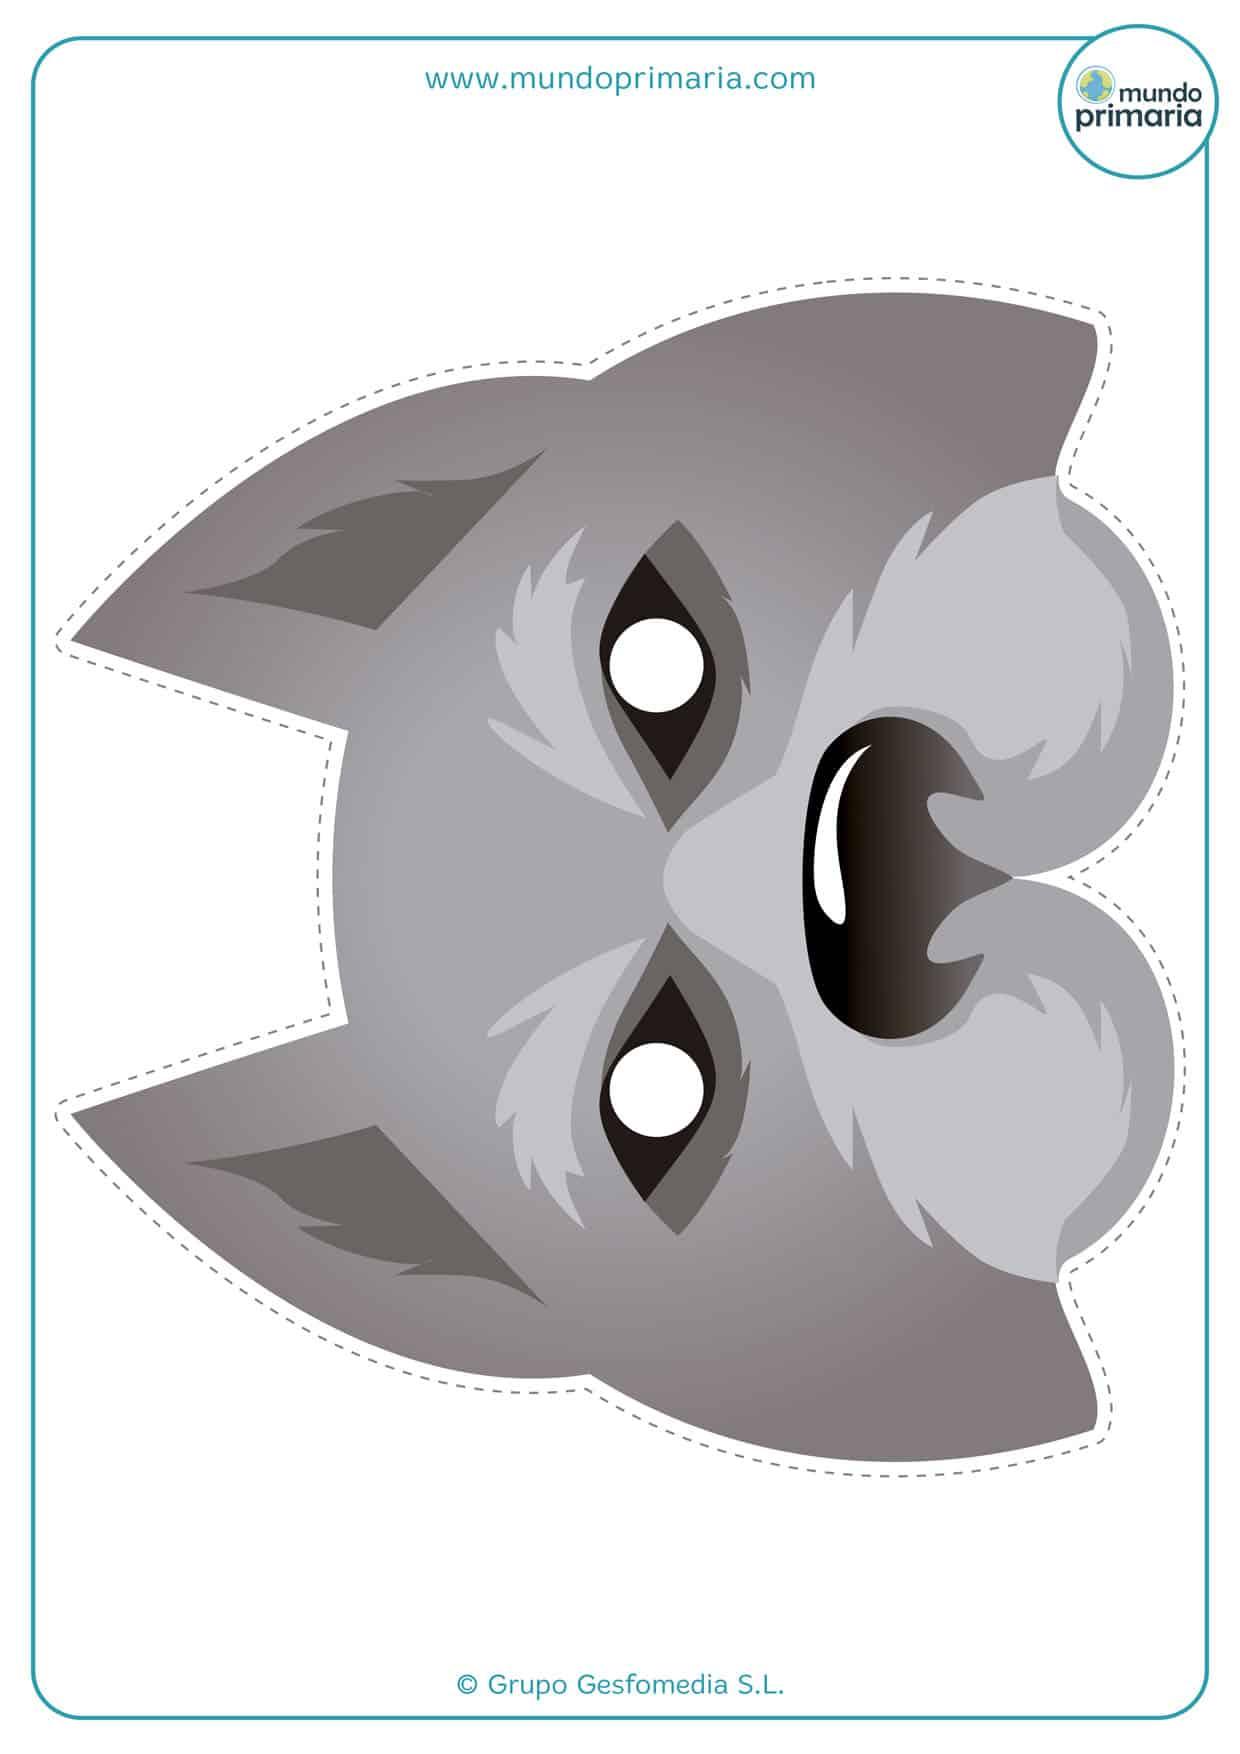 Careta de hombre lobo para imprimir de color gris